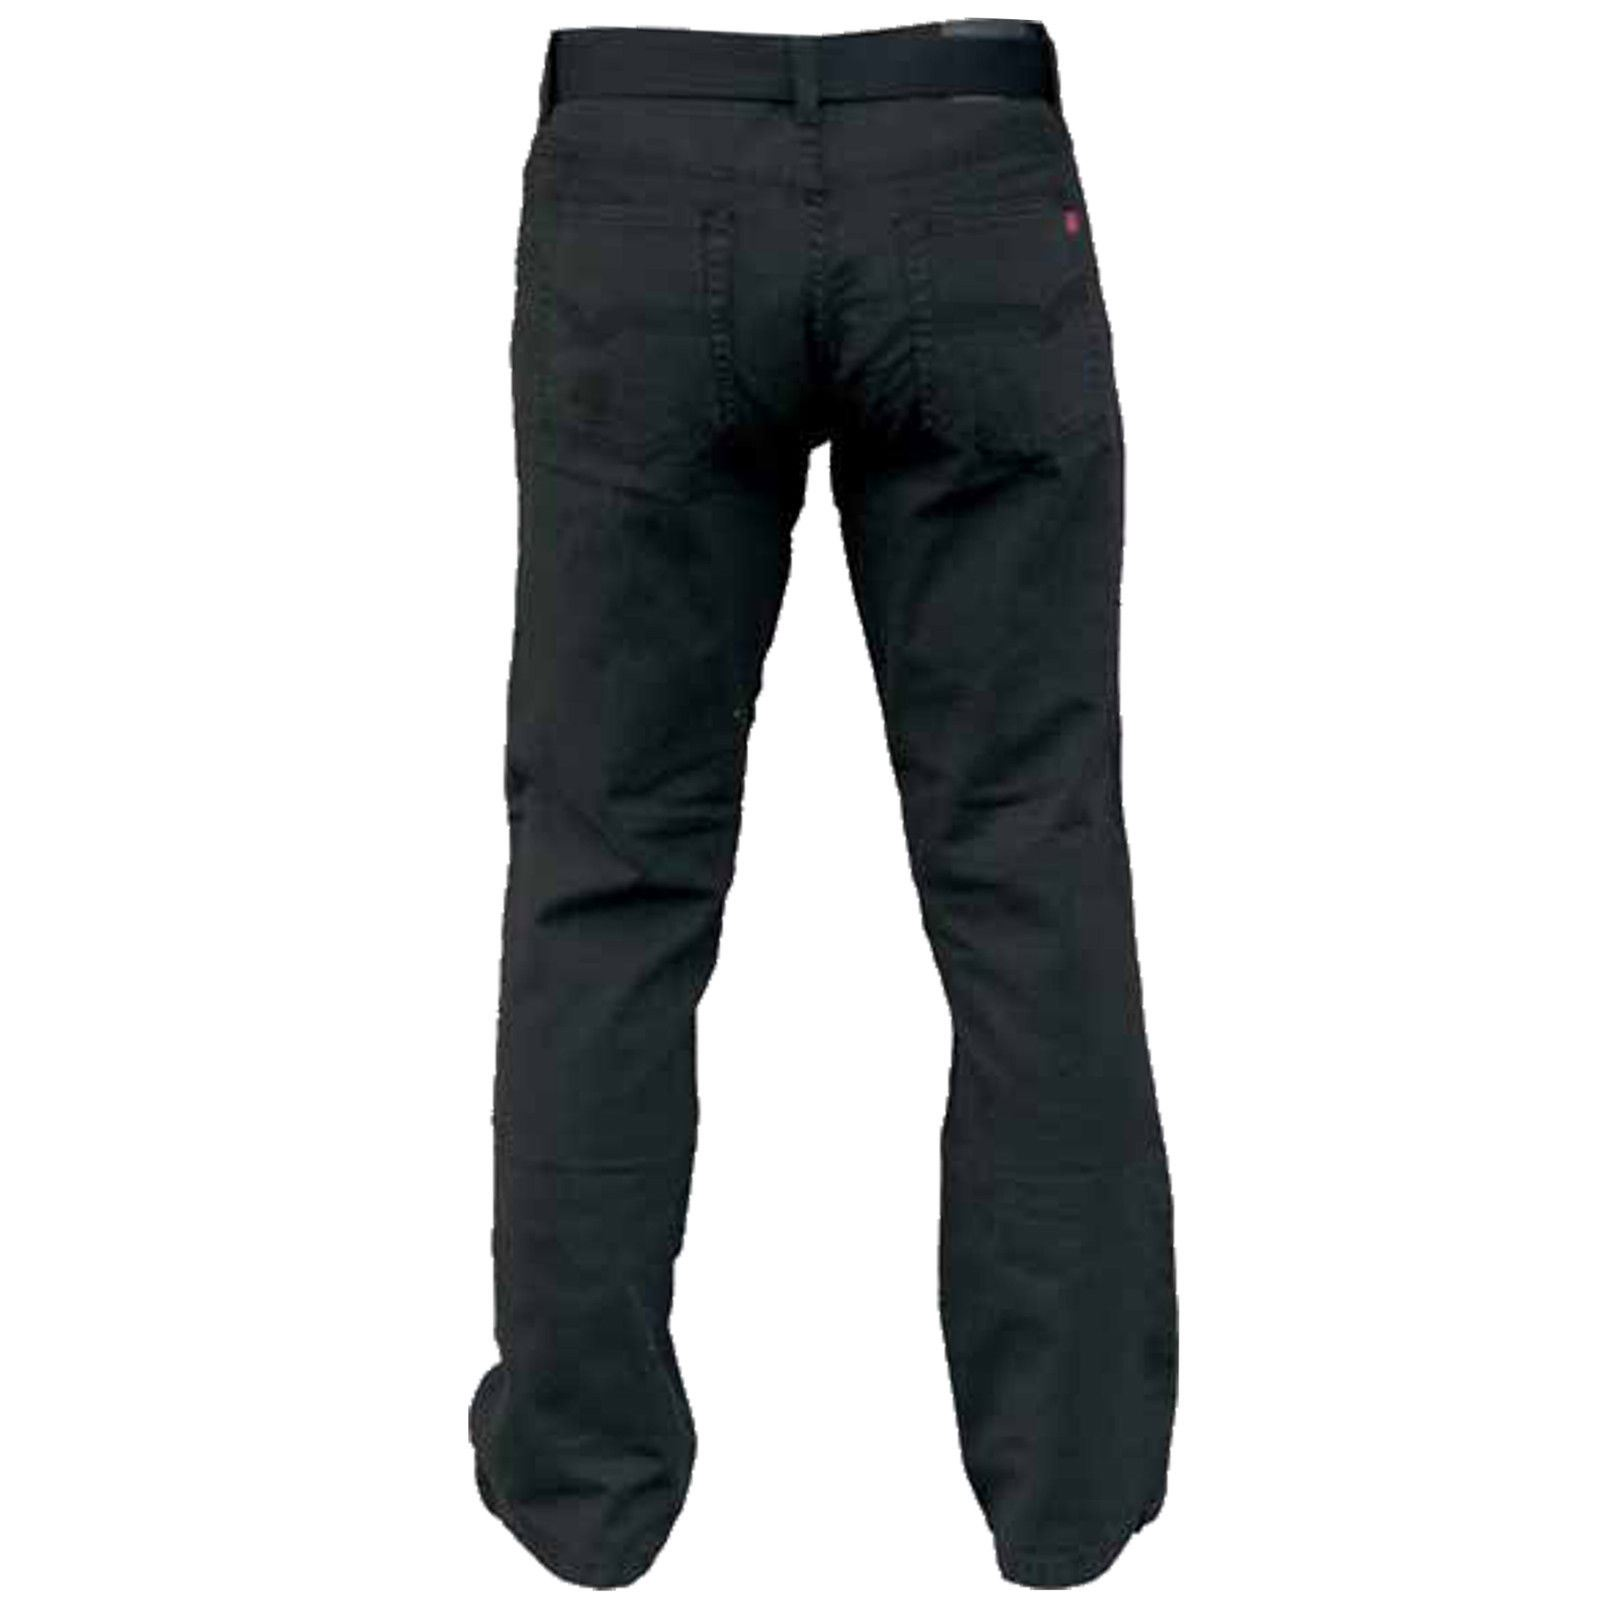 "50/"" Gratuit Ceinture Homme Duke Long Tall XL Jambe 38/"" Taille Cordon Noir Jeans Taille 32/"""